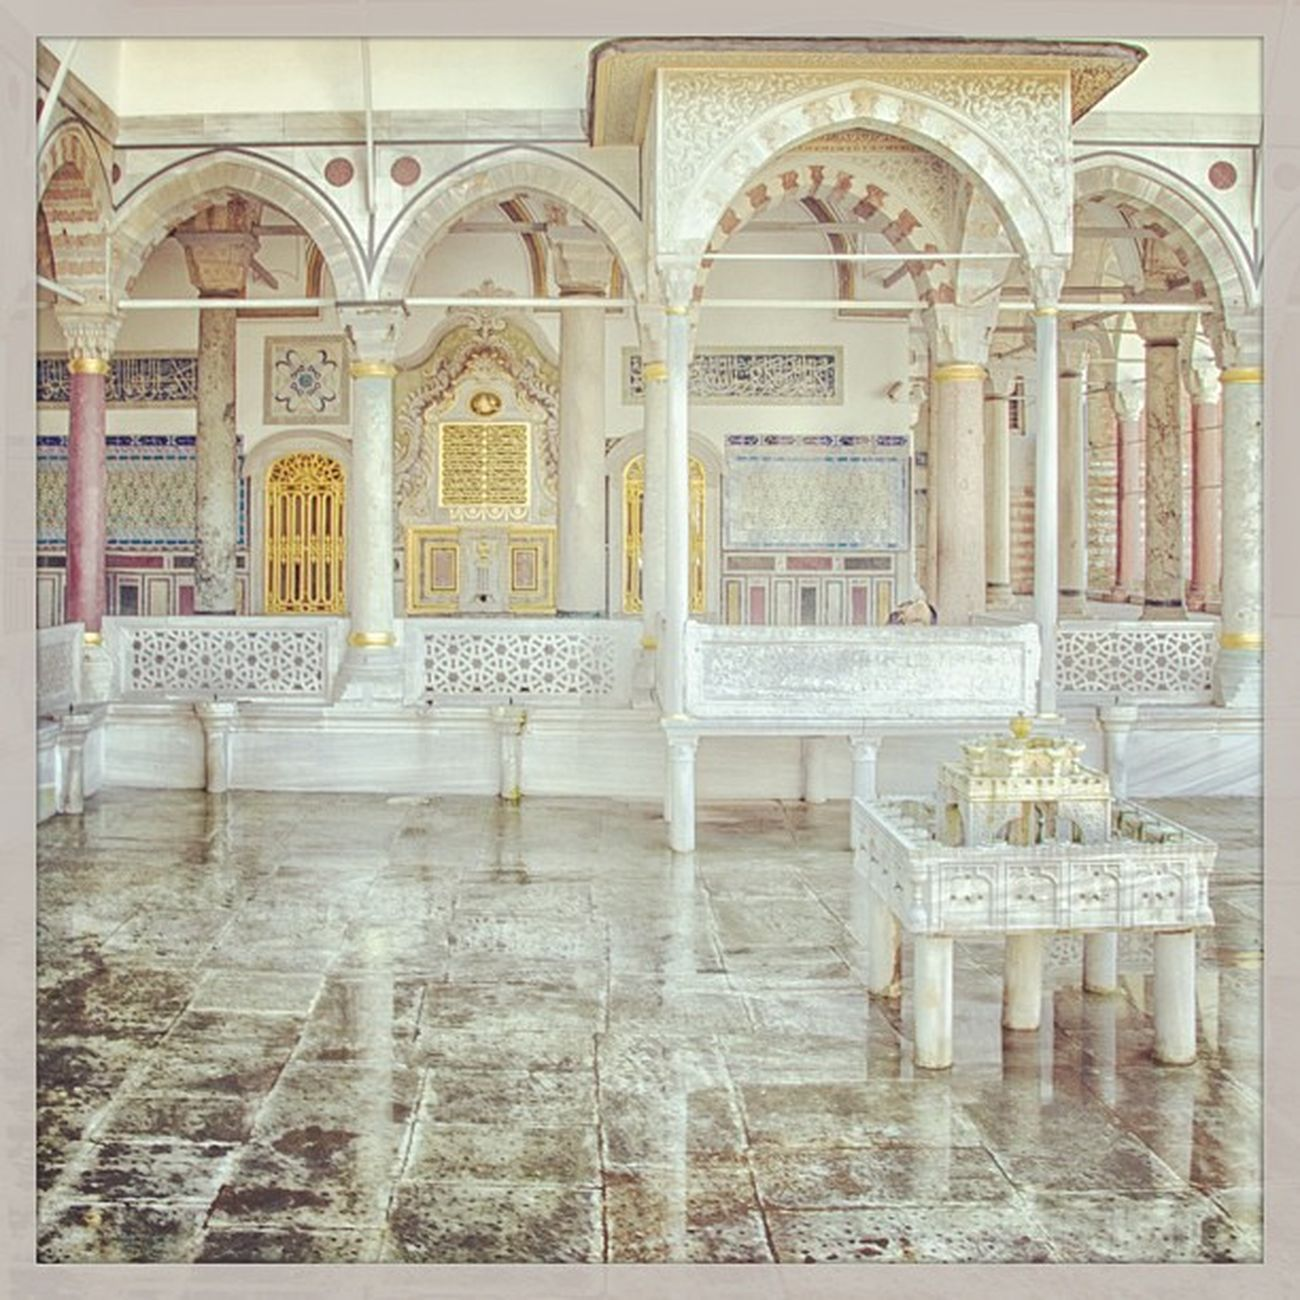 Topkapi Palace Topkapisarayi Saray architech mimari islam turkiye istanbul fatih